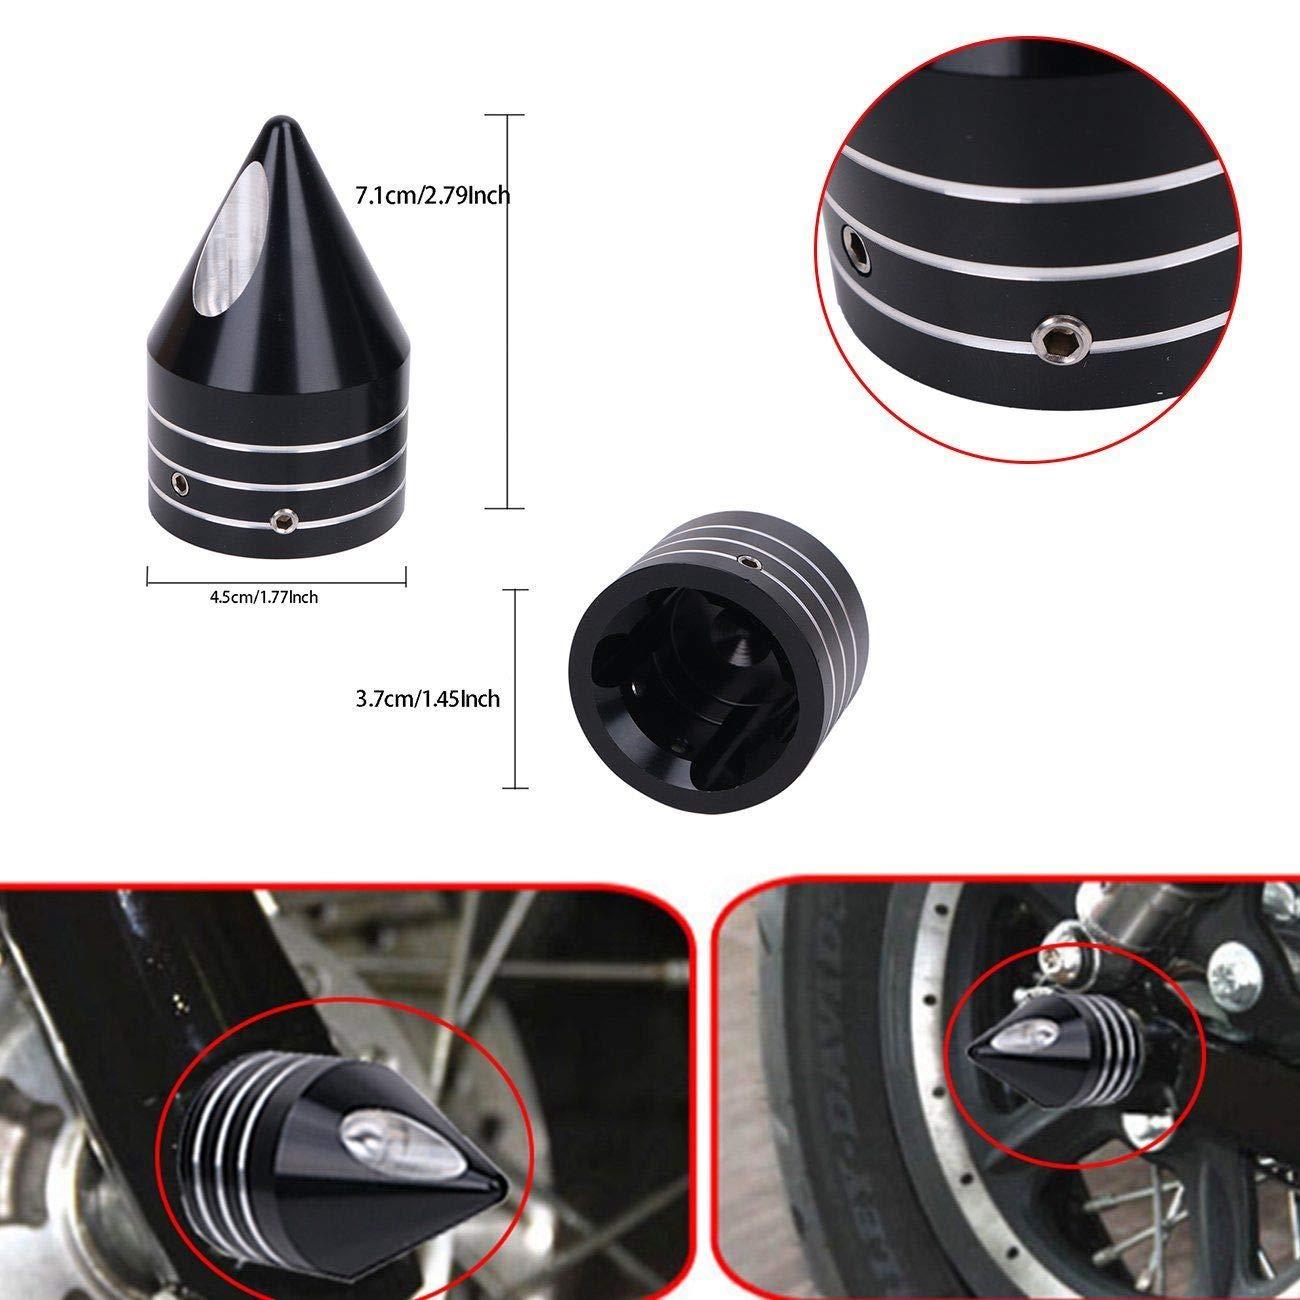 2Pcs 29.5mm Black Deep Cut Front Axle Cap Nut Cover Wheel Cap Bolt For Harley Softail Dyna V-Rod Sportster 1200 883 CVO